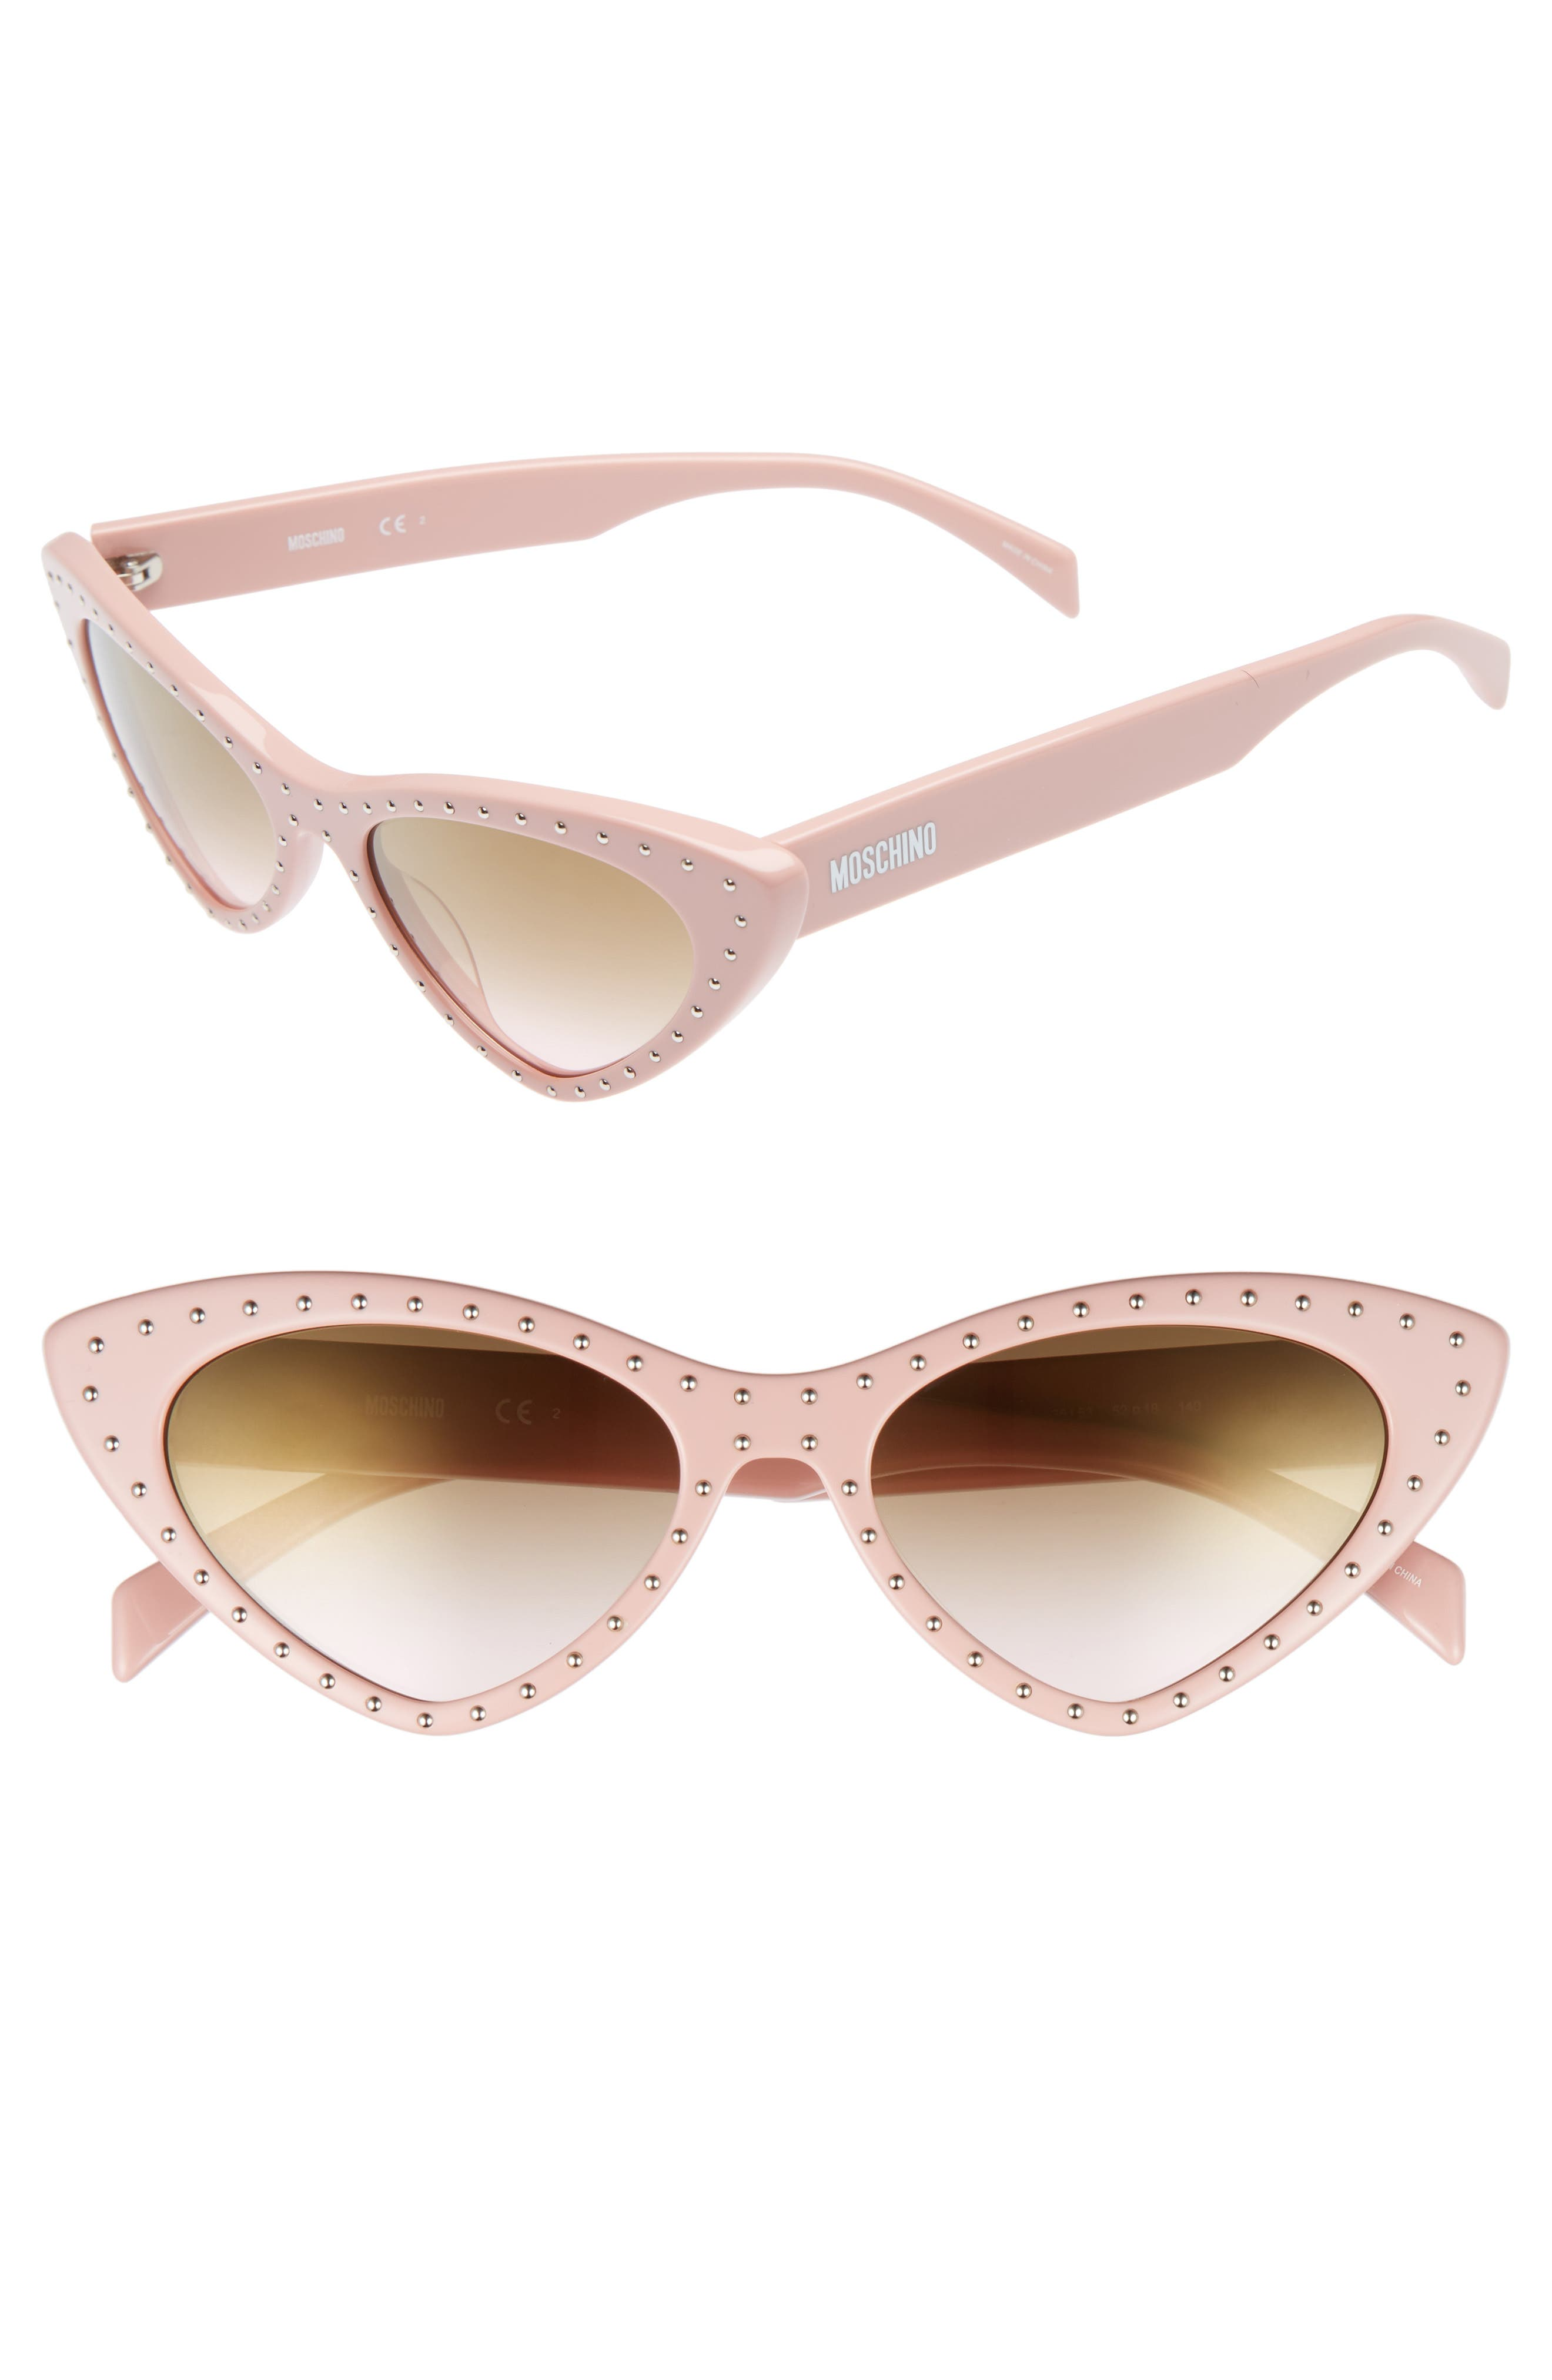 52mm Cat's Eye Sunglasses,                             Main thumbnail 1, color,                             PINK